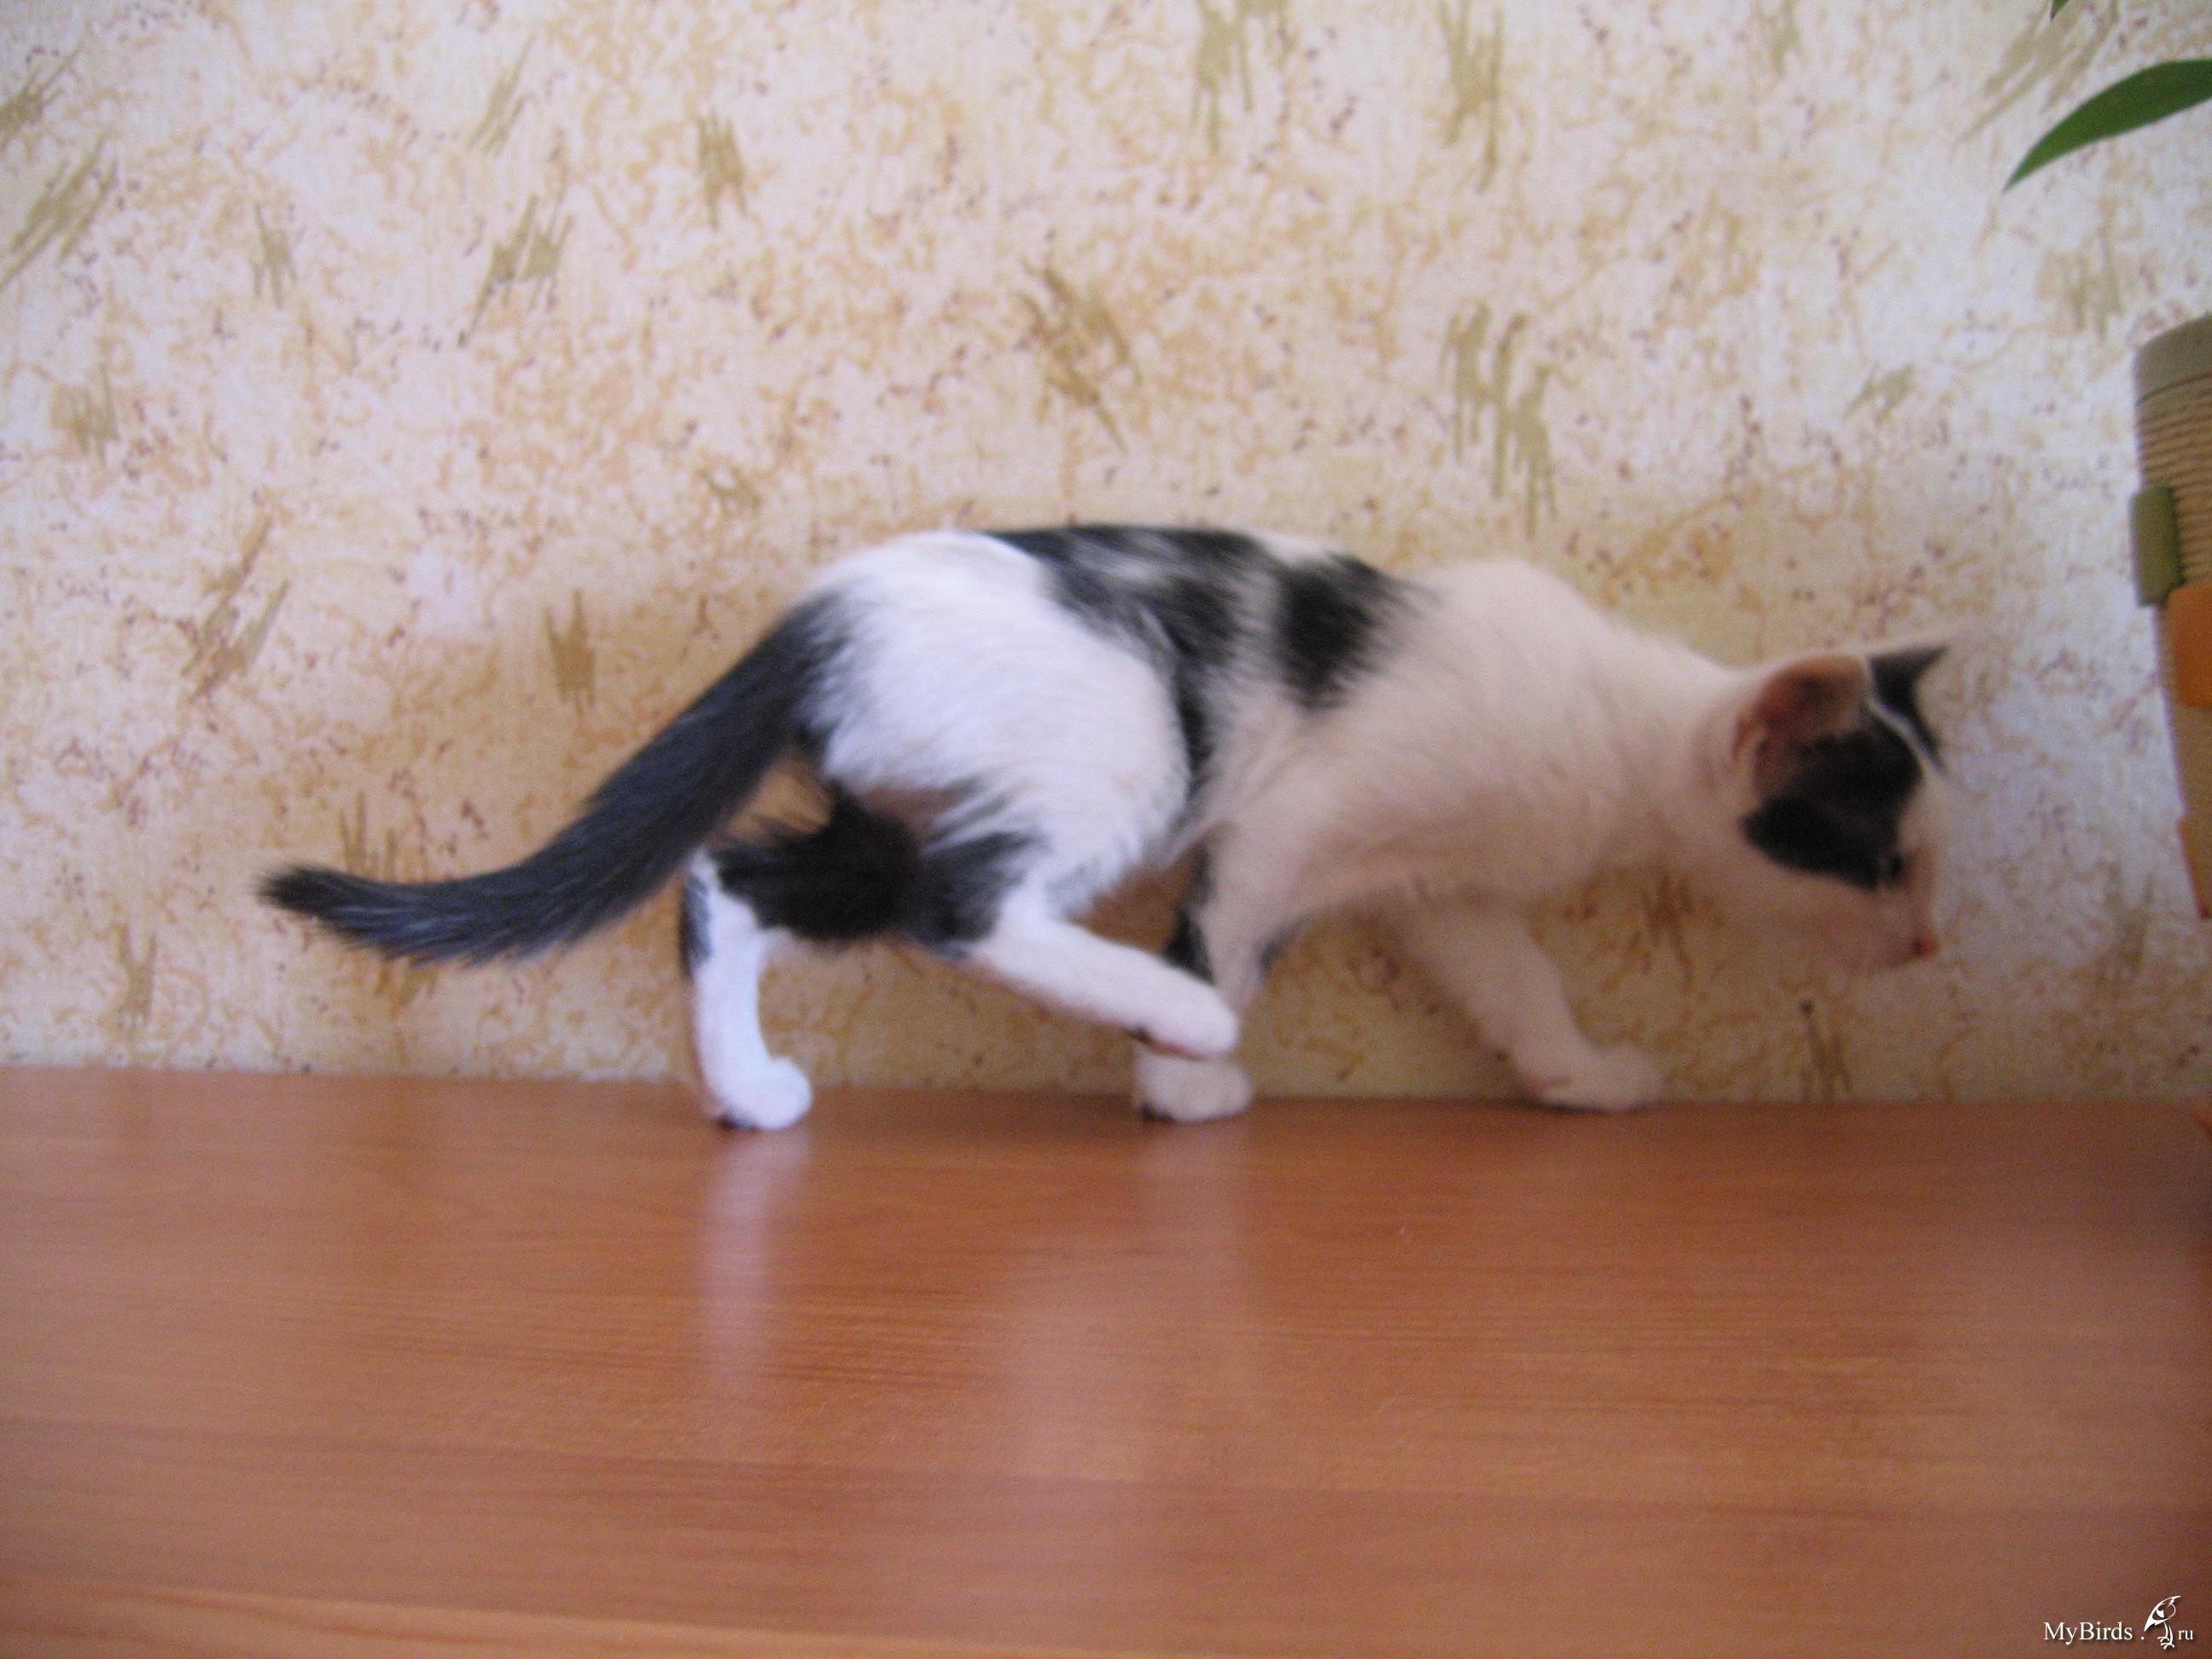 Роды у кошки: признаки начала и процесс родов 8